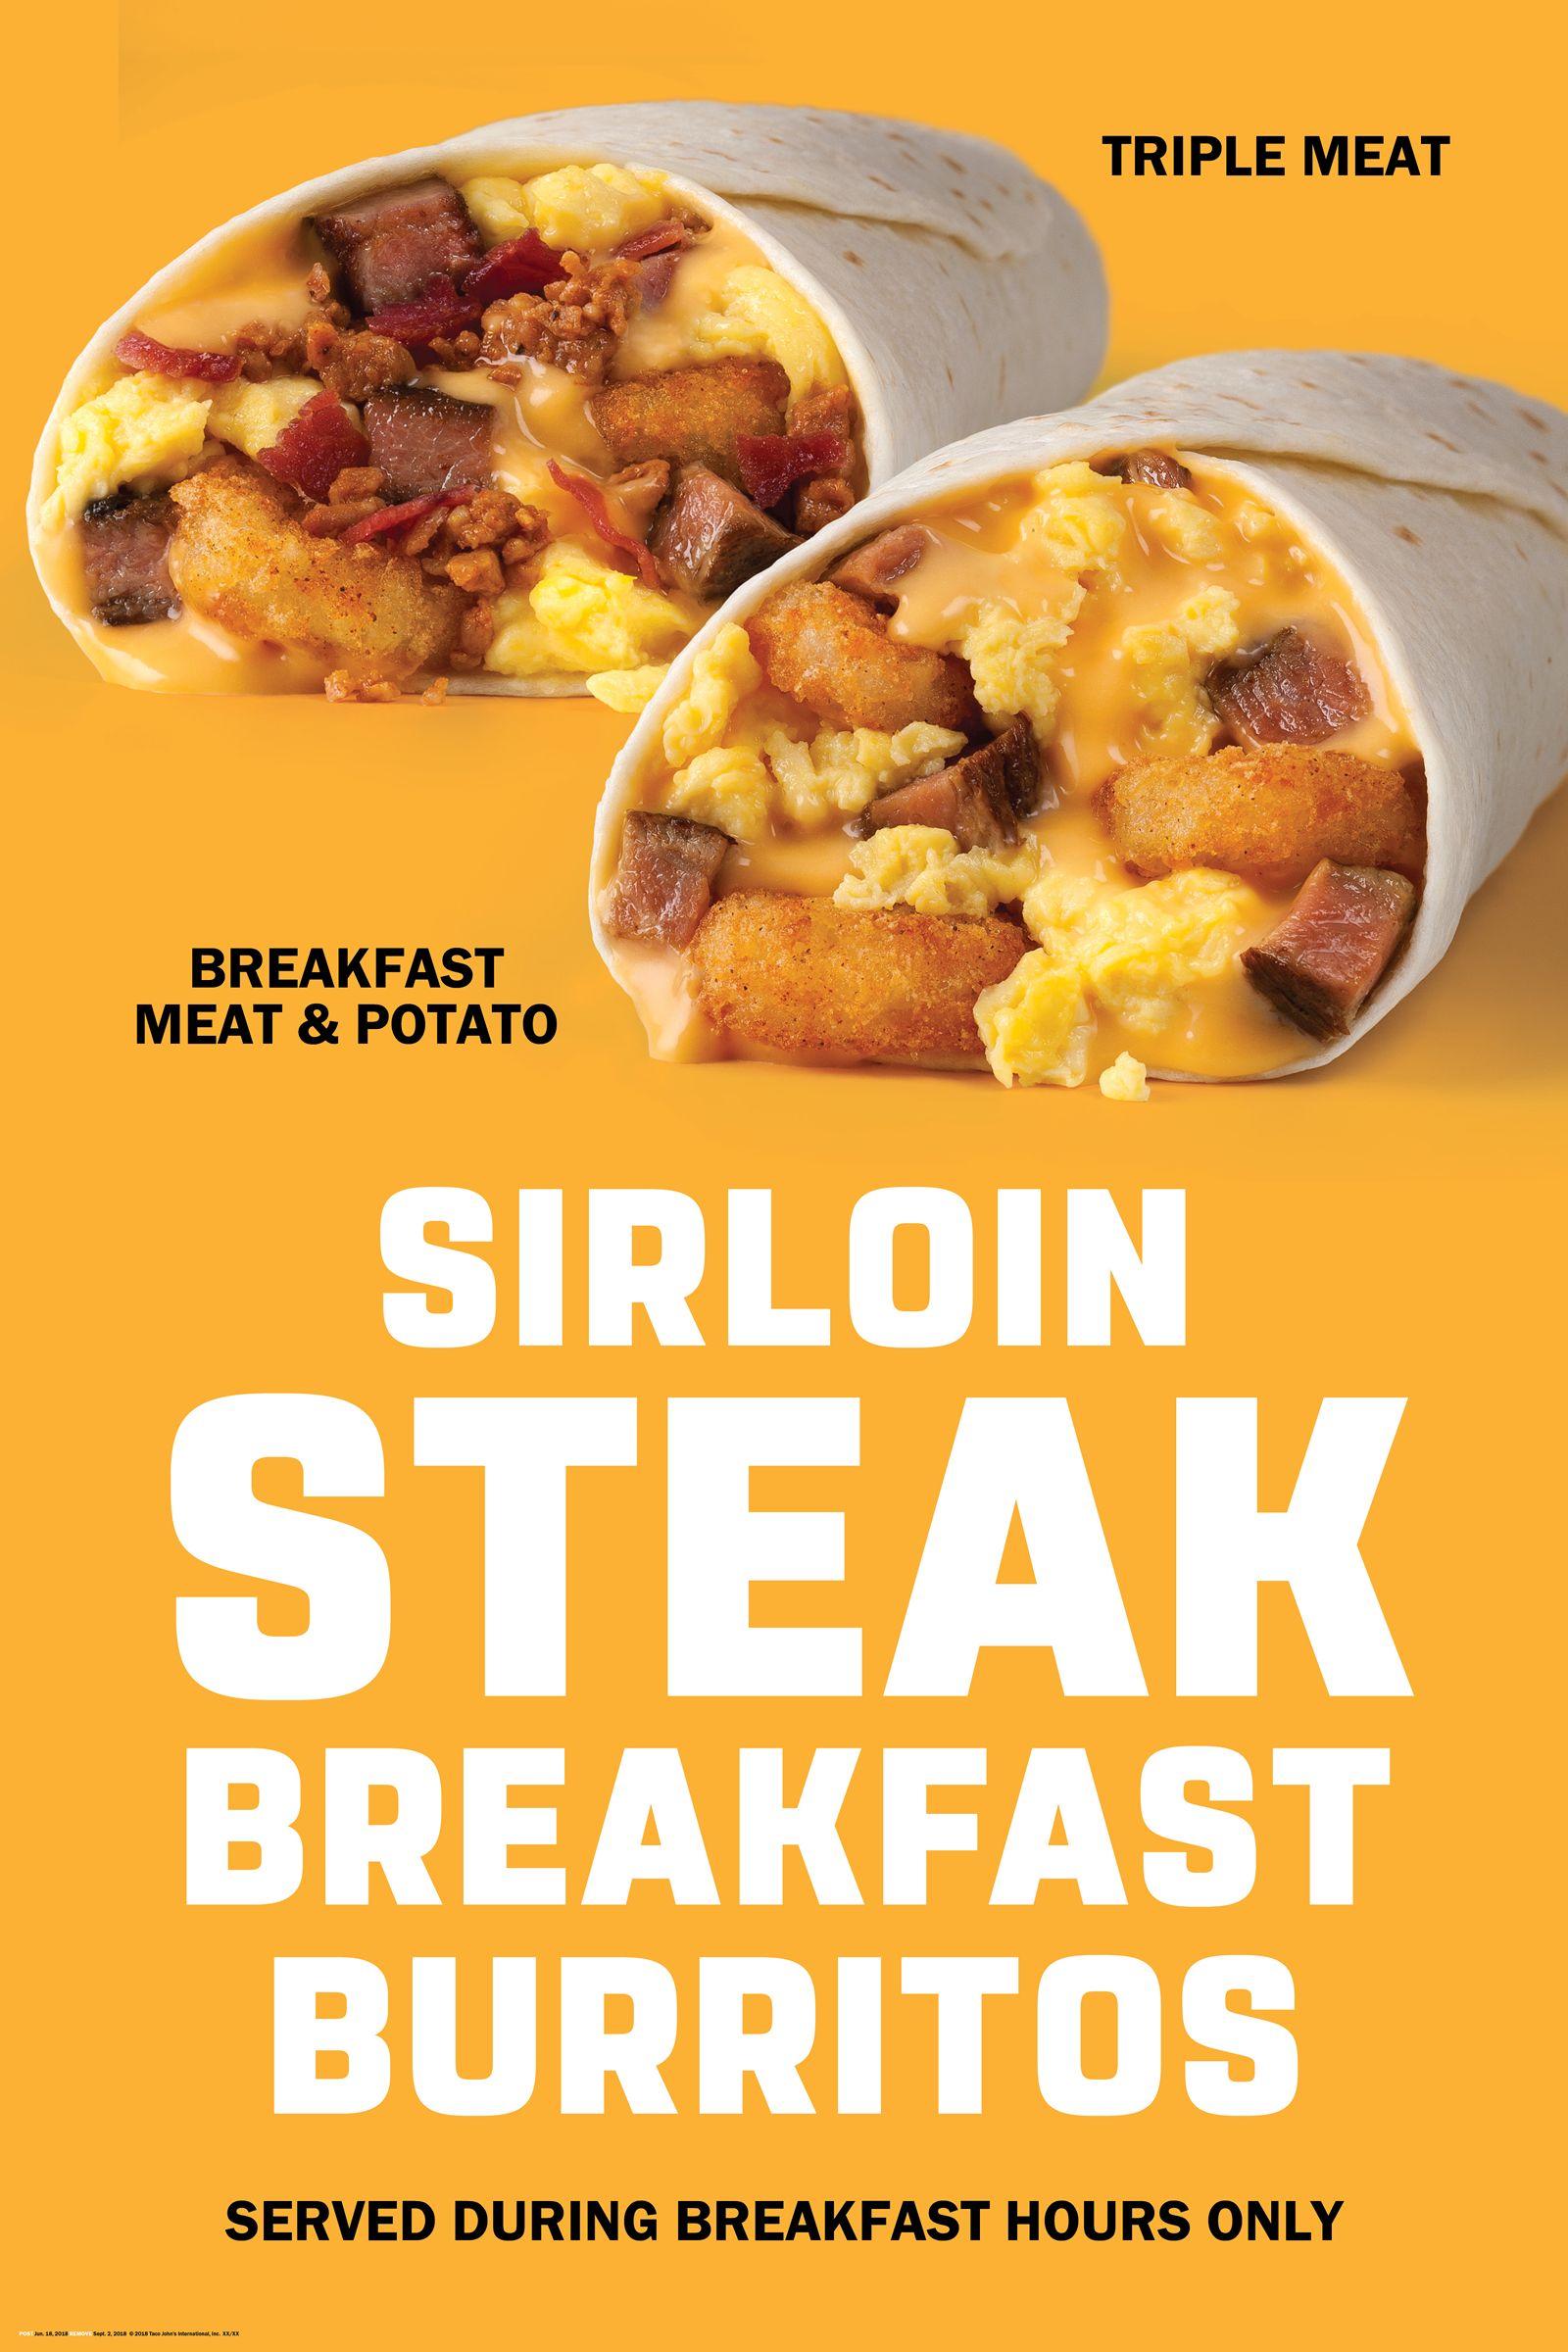 Taco John's Introduces Six New Sirloin Steak Burritos